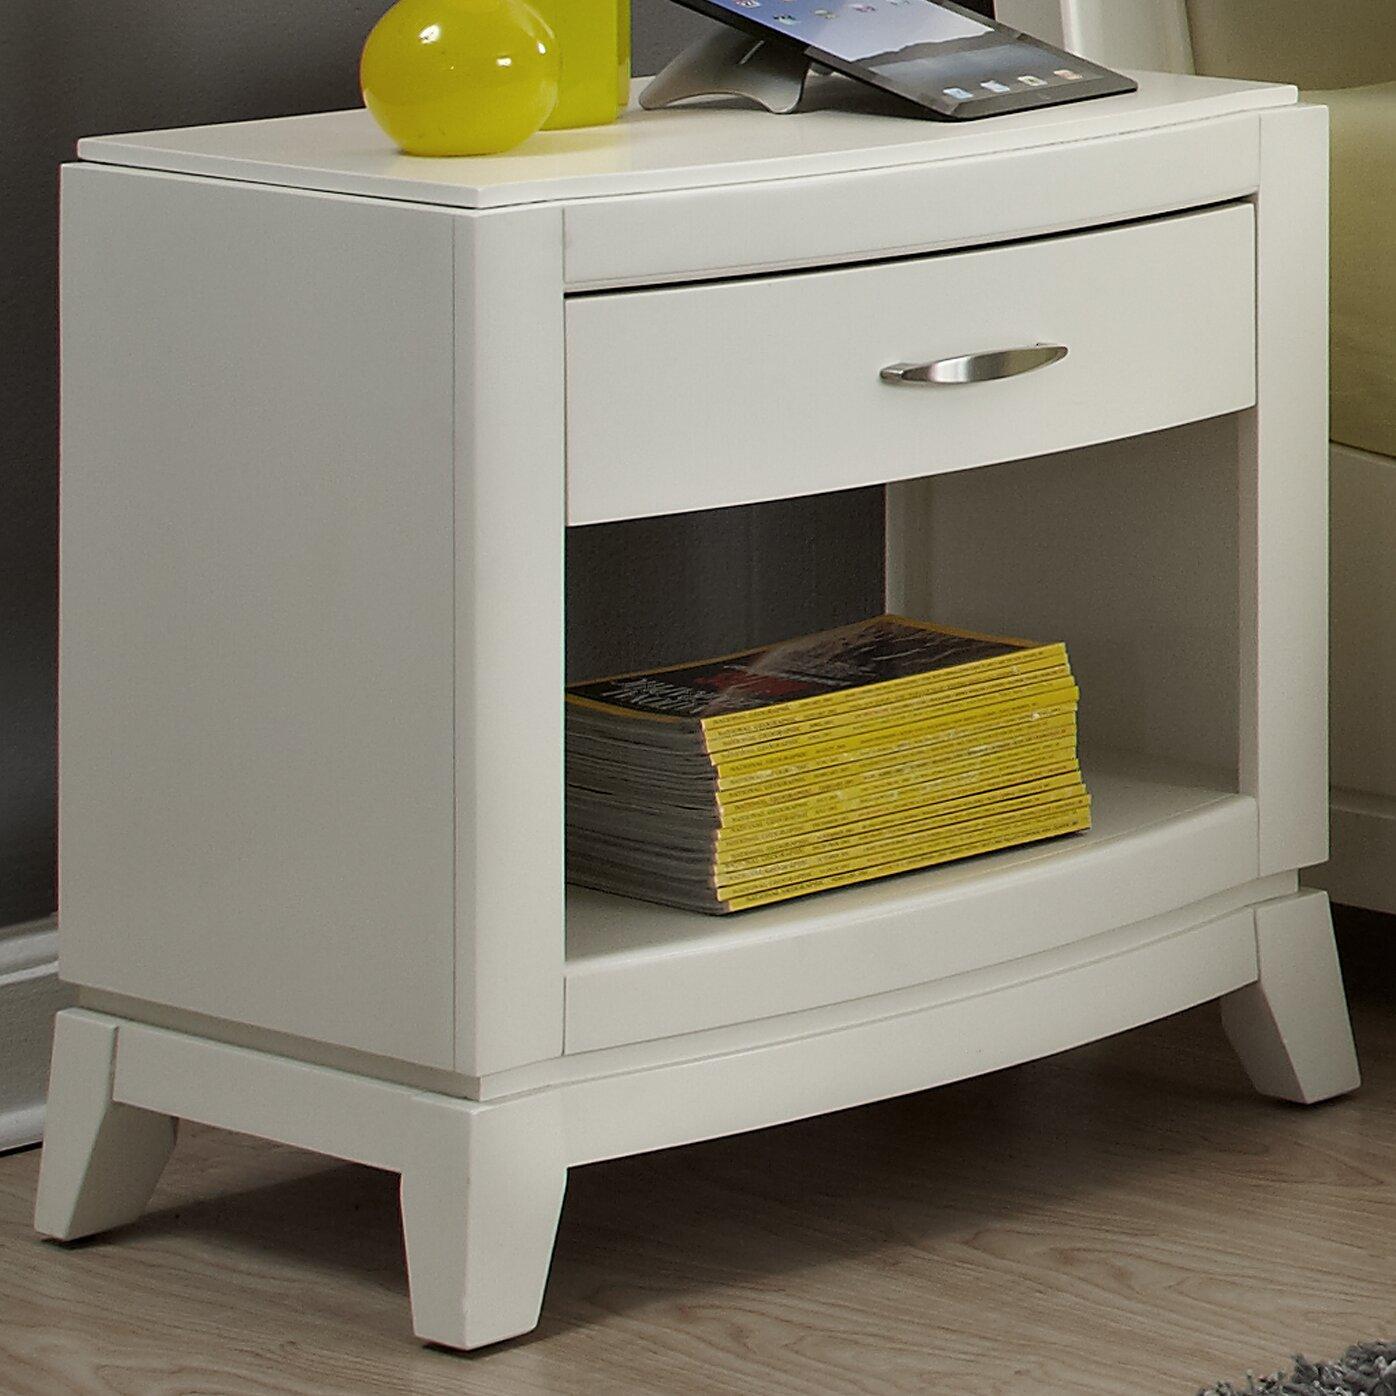 liberty furniture avalon storage platform customizable